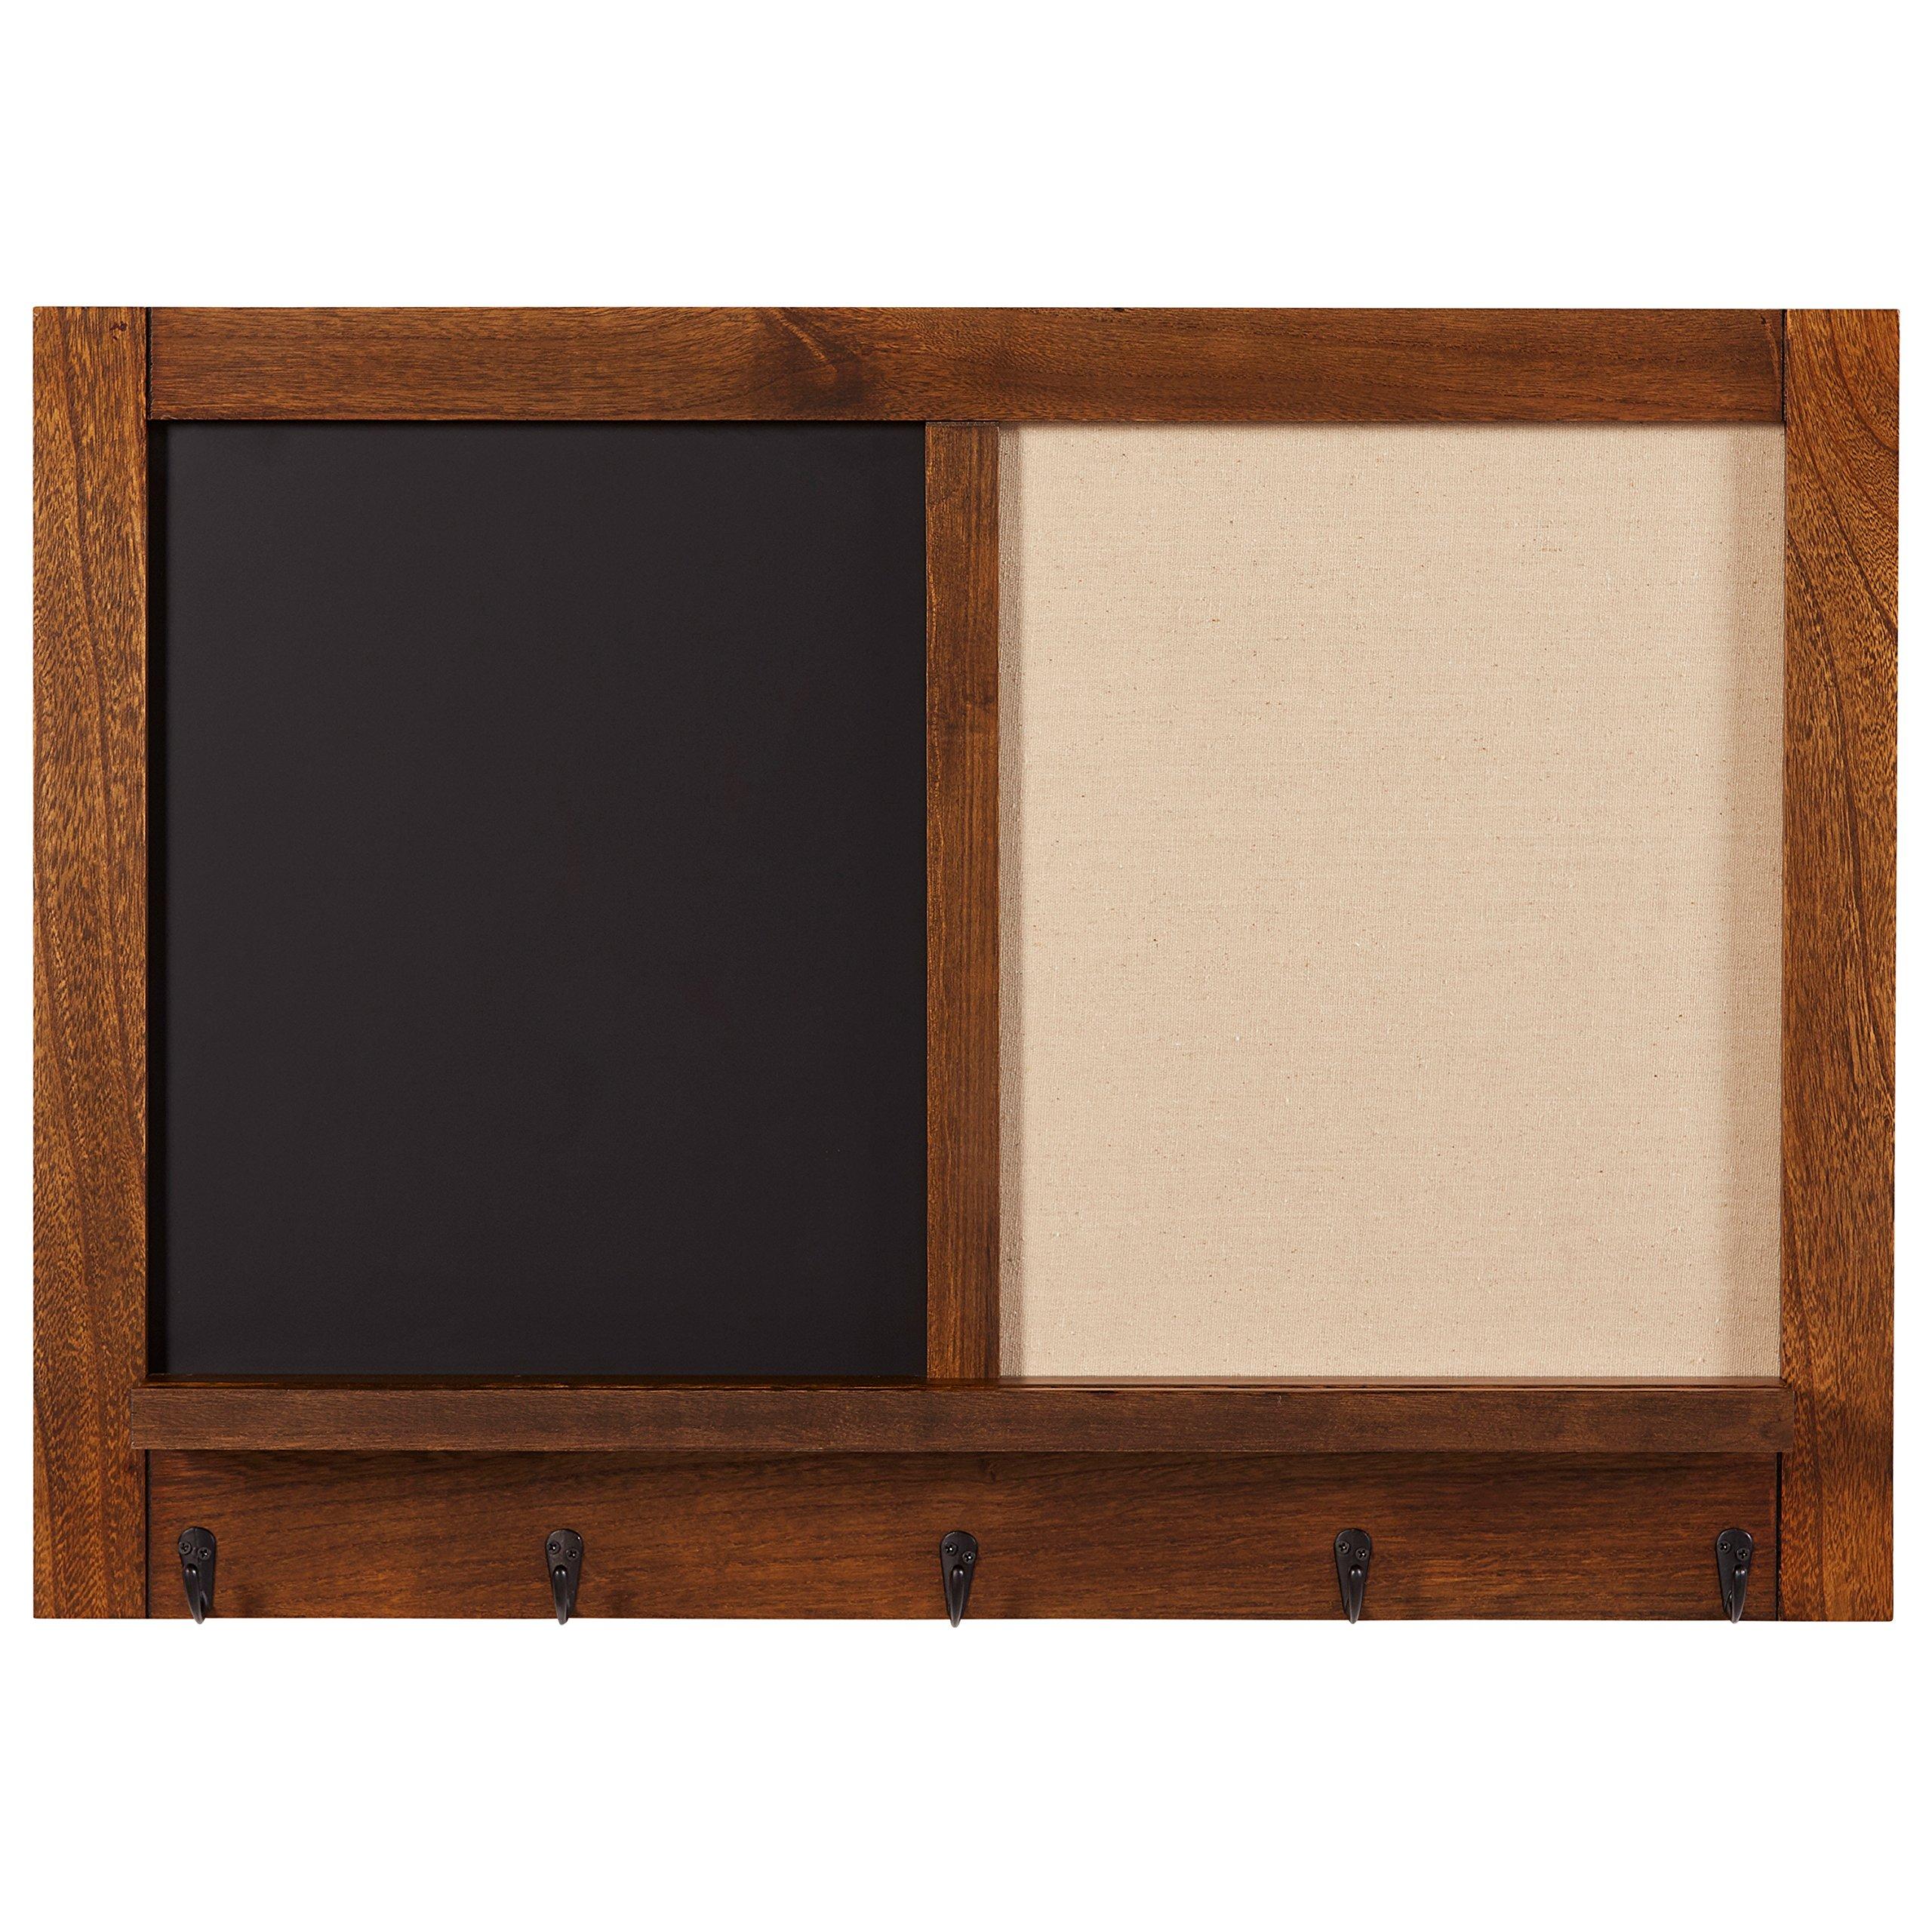 Stone & Beam Modern Wood Message Board, 30''H, Walnut And Black by Stone & Beam